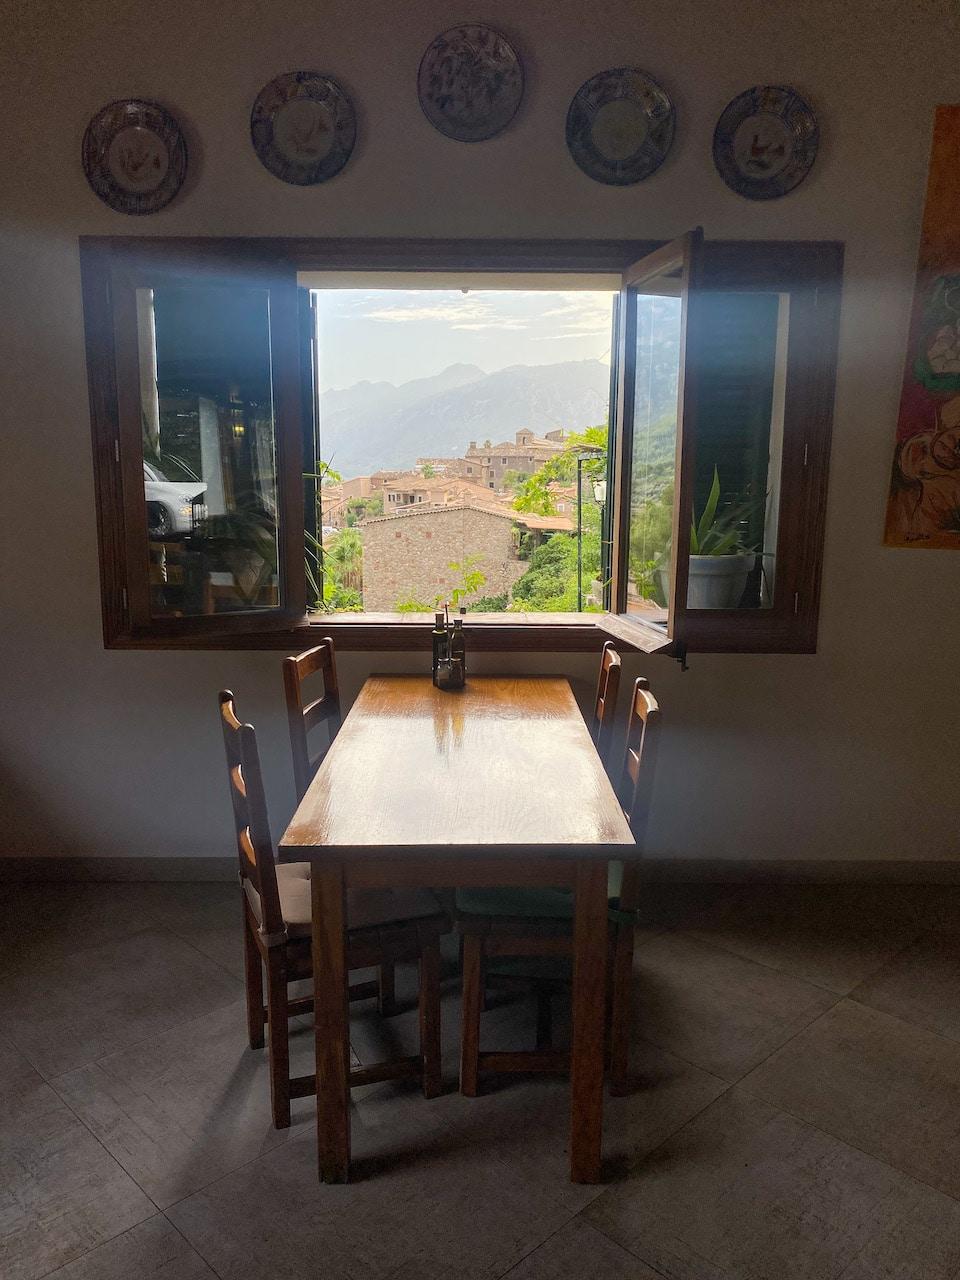 resataurant met mooi uitzicht westen Mallorca - Ca N'Autuna - Fornalutx